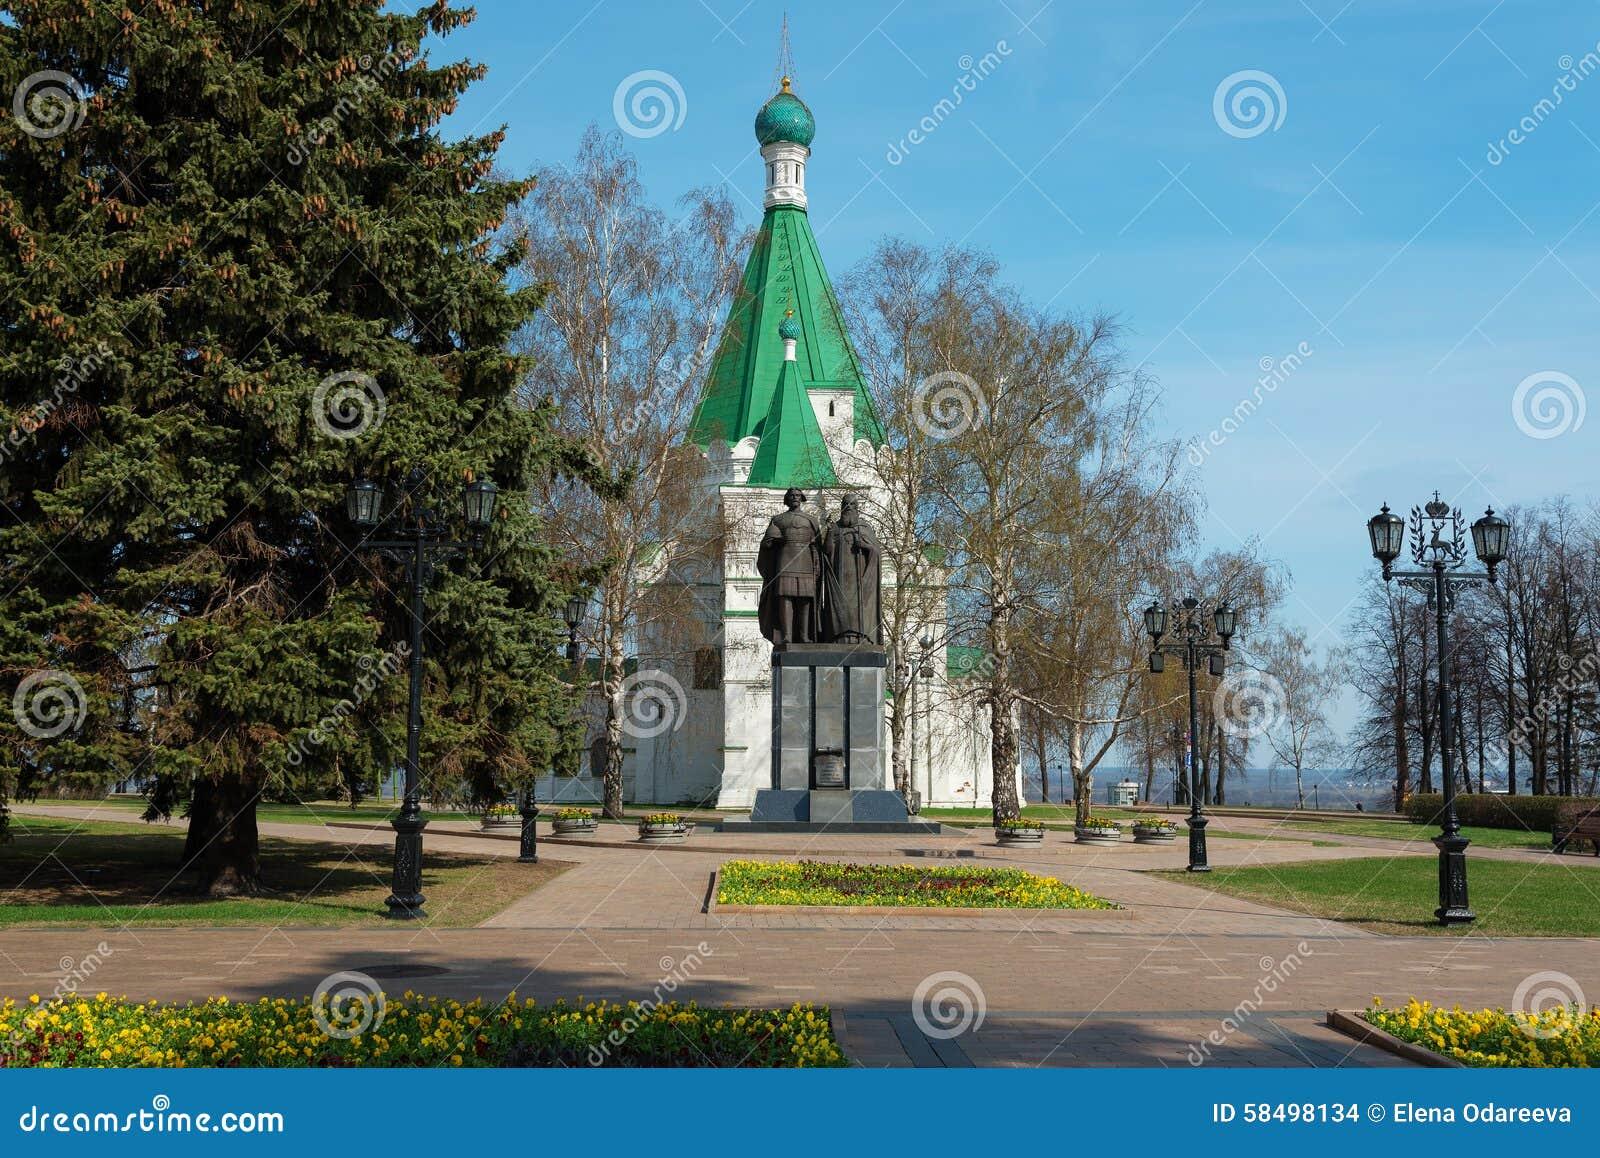 St. Michael the Archangel (Nizhny Novgorod): description, history of the church